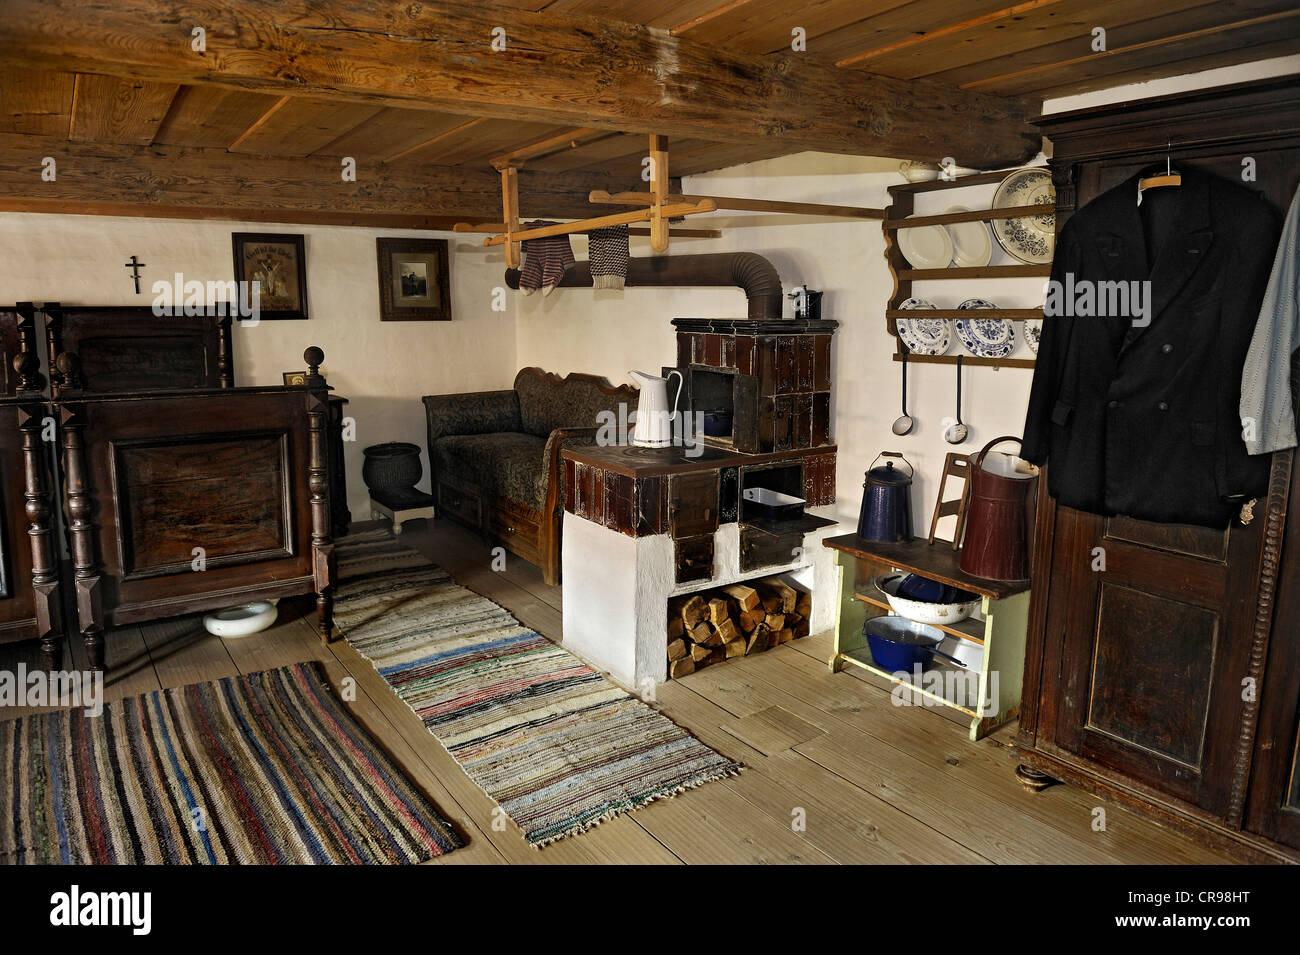 Bedroom with a tiled stove, Bernoeder Hof farmhouse, Bauernhausmuseum Amerang farmhouse museum, Amerang, Bavaria - Stock Image